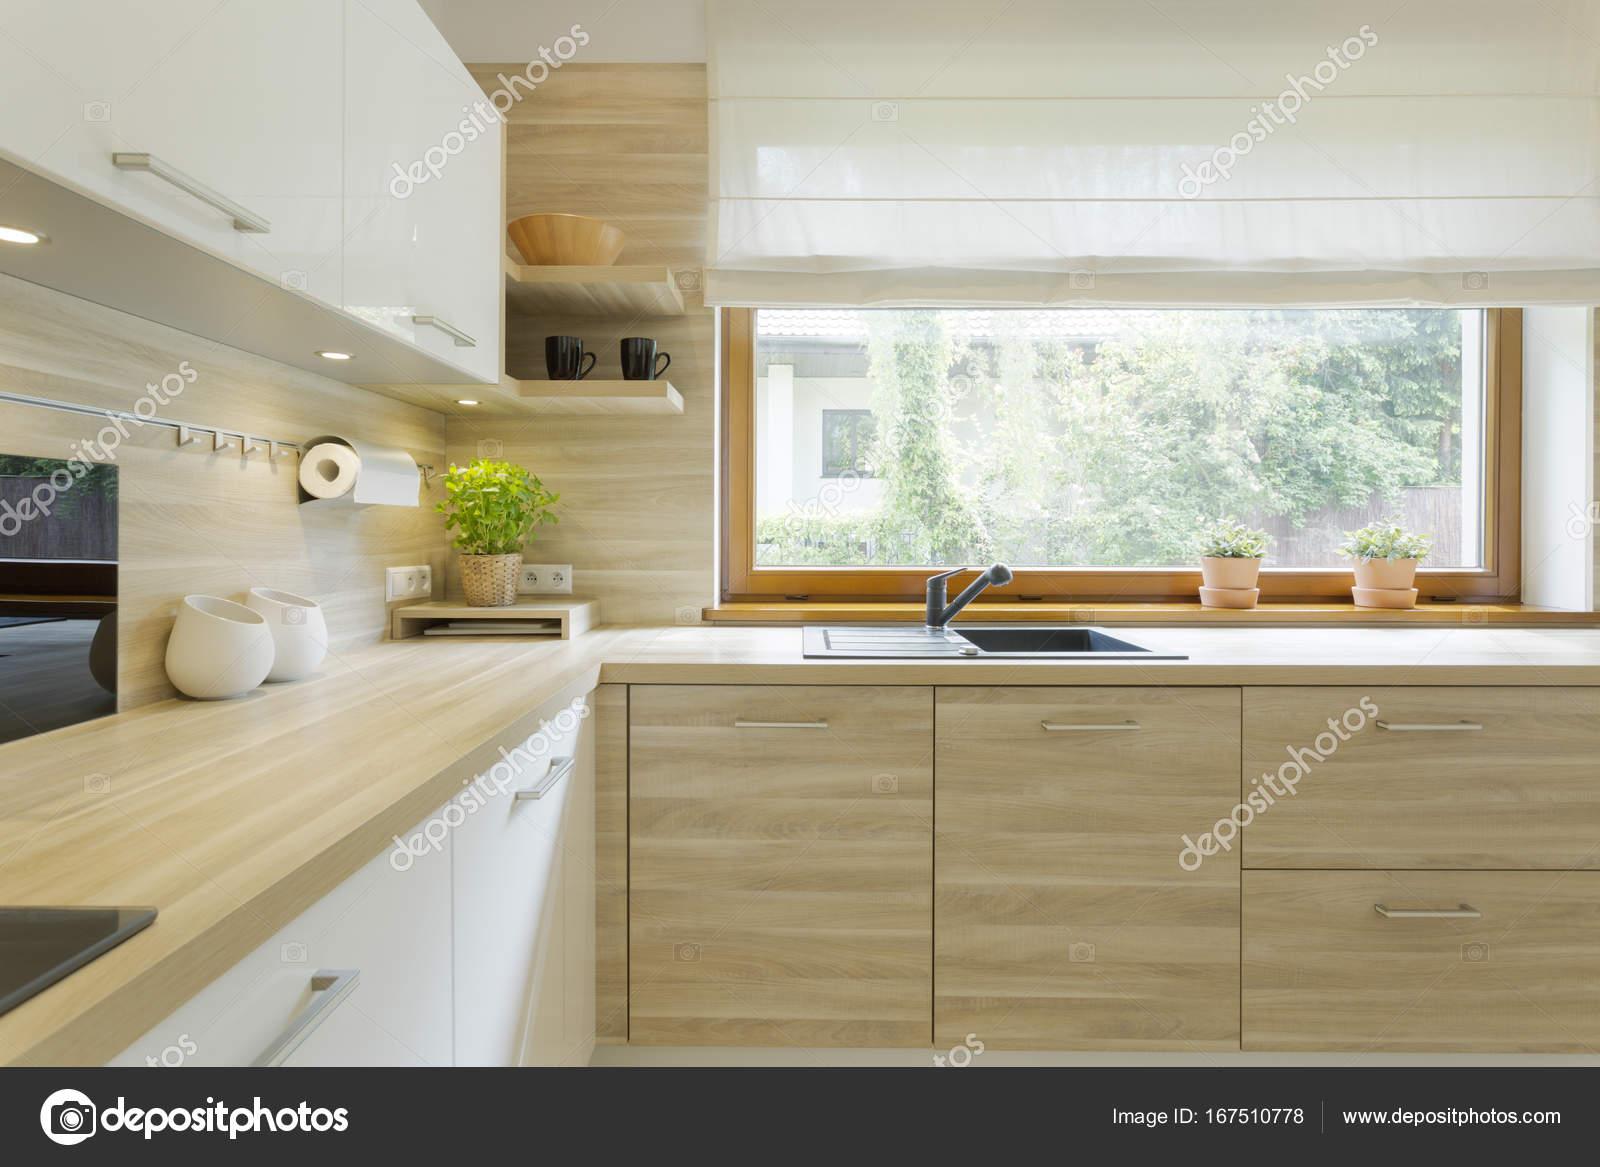 Moderne Küche mit Holzschränke — Stockfoto © photographee.eu #167510778